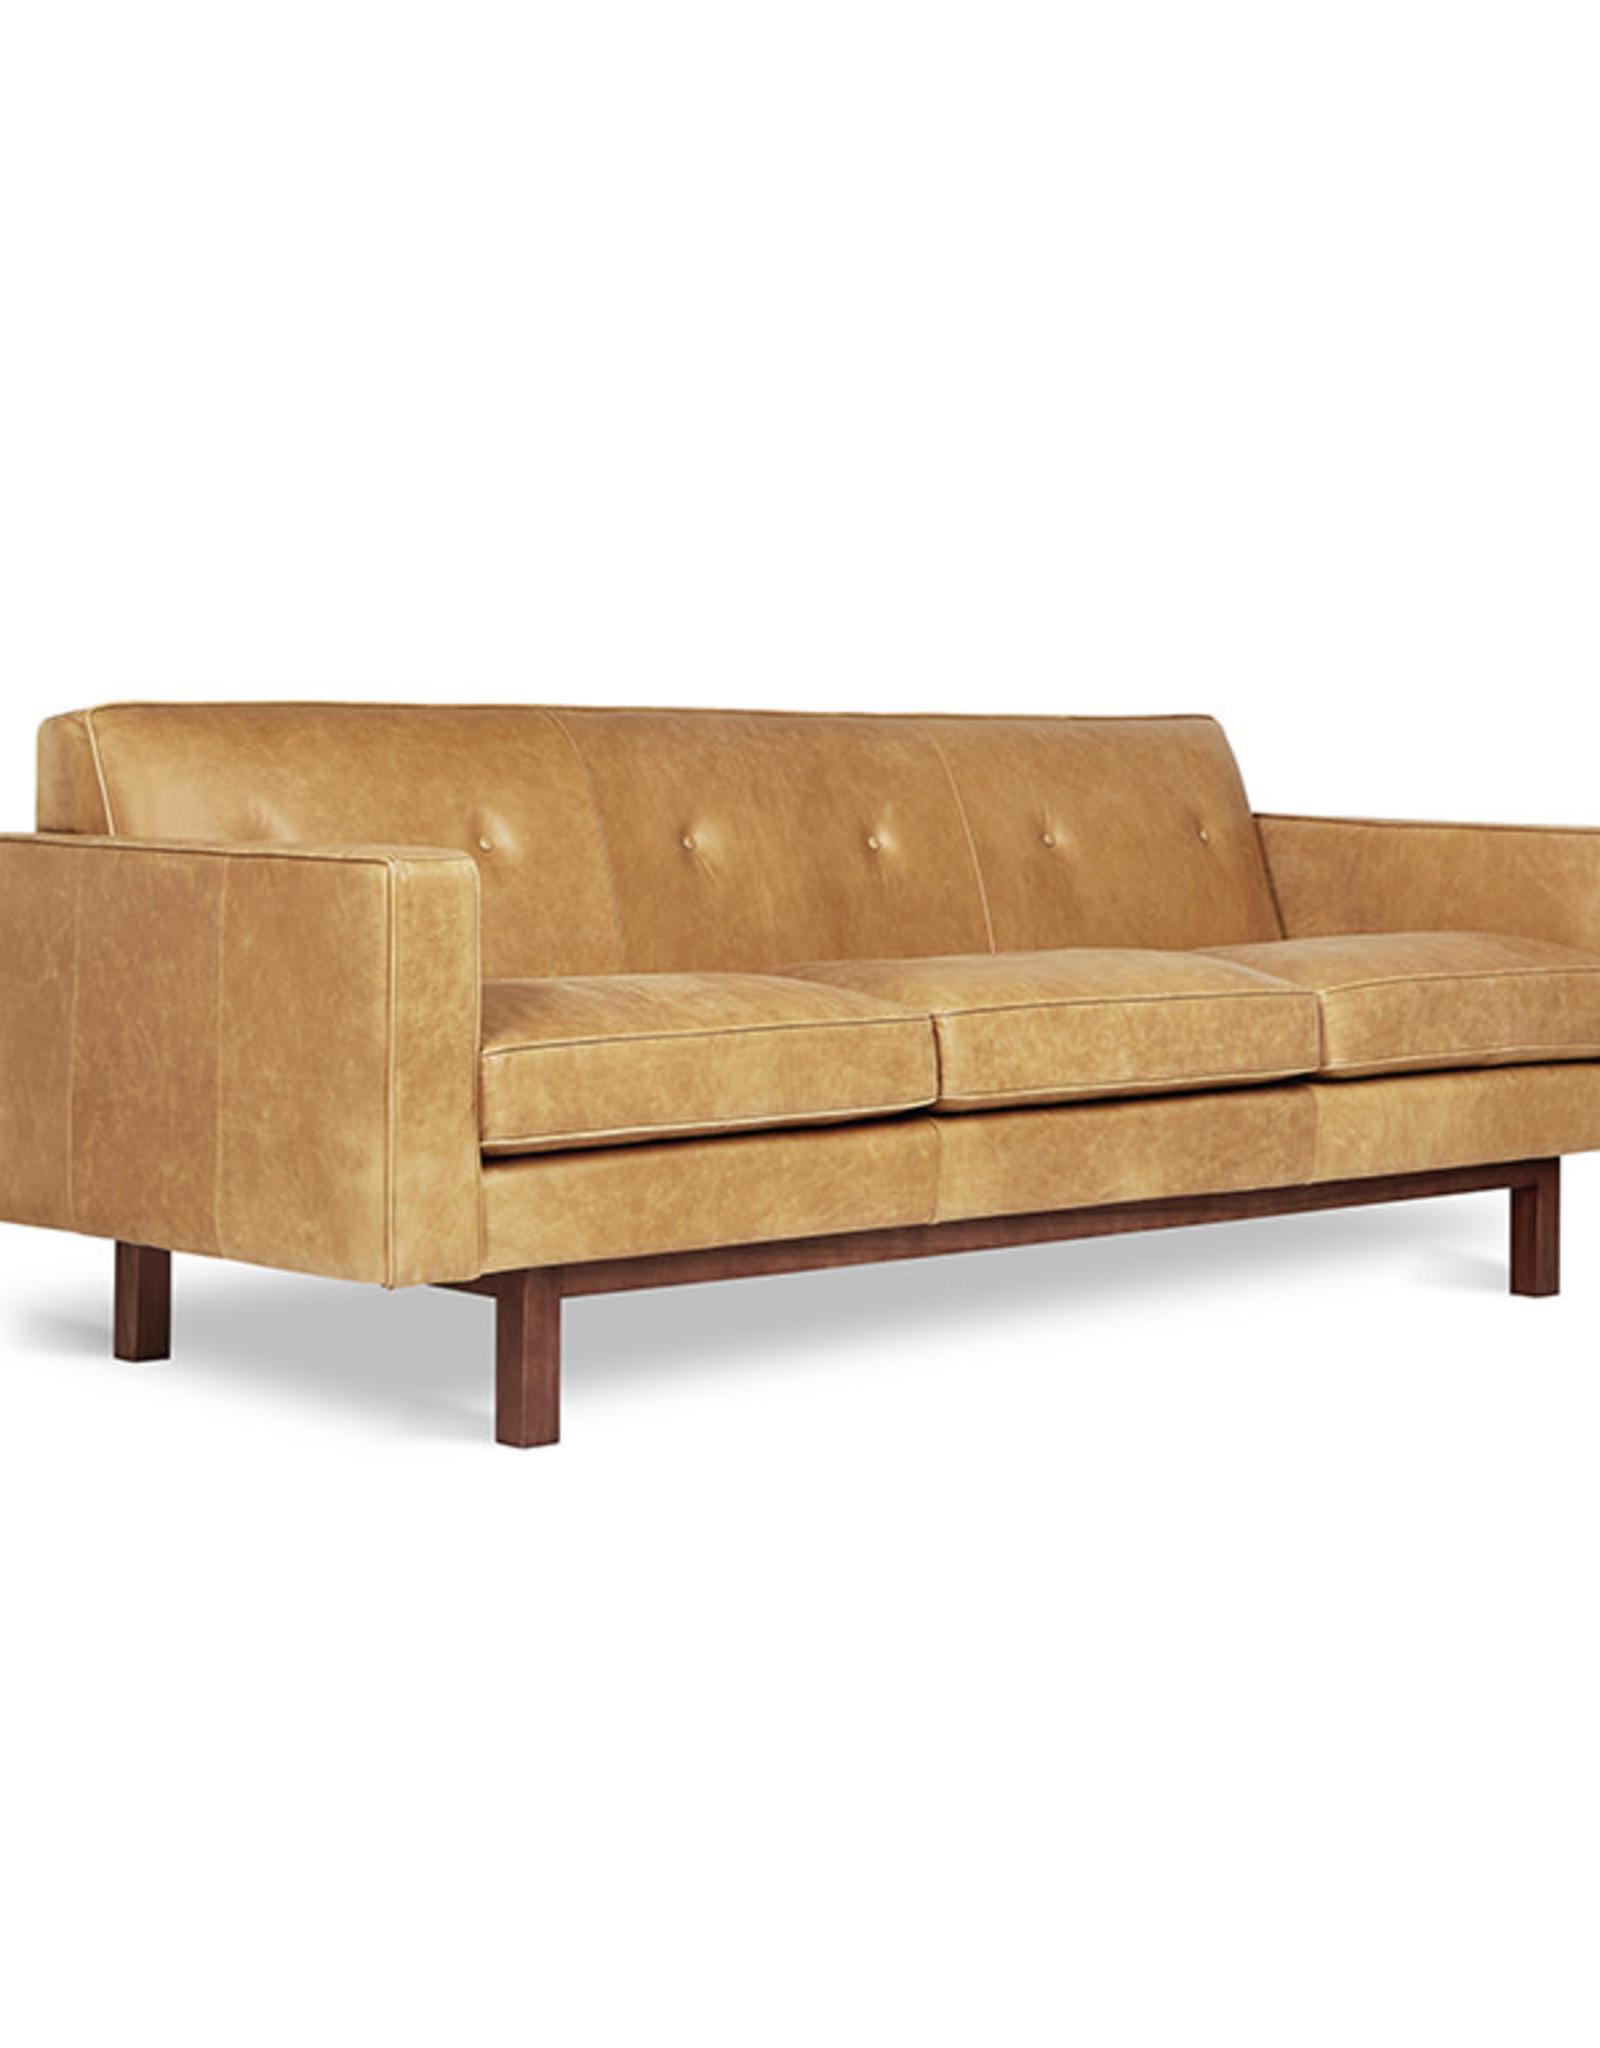 Gus* Modern Embassy Sofa